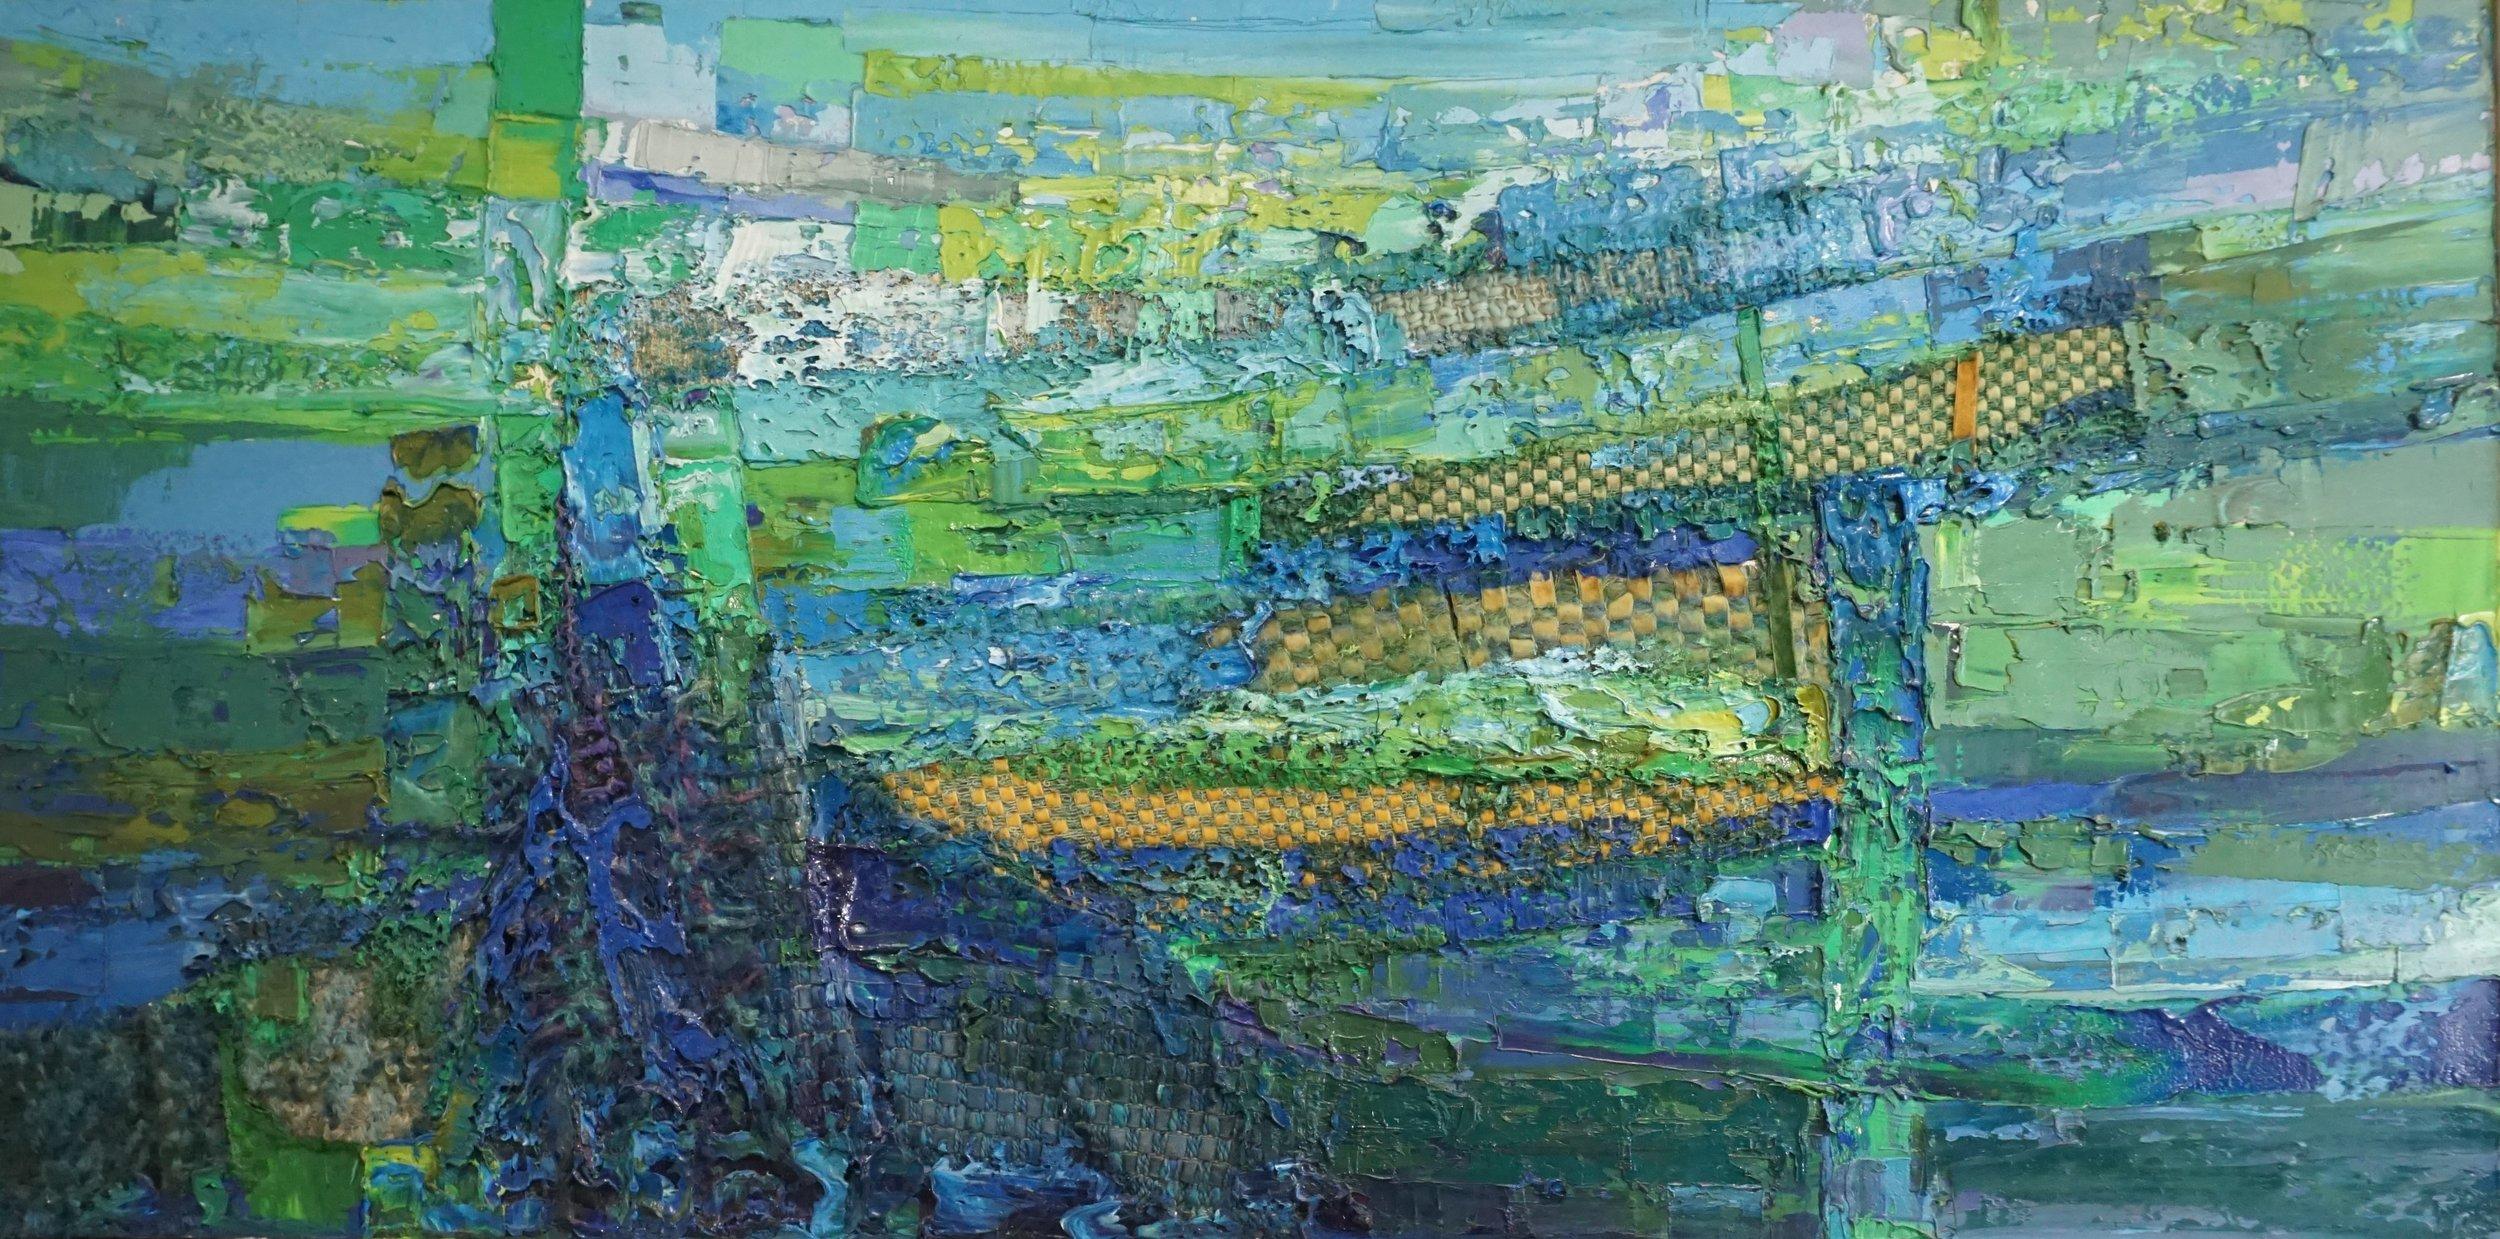 Bernat Klein (1922 - 2014),  Evening Blue, Oil and woven textiles on canvas, 96 x 187.5 cm.